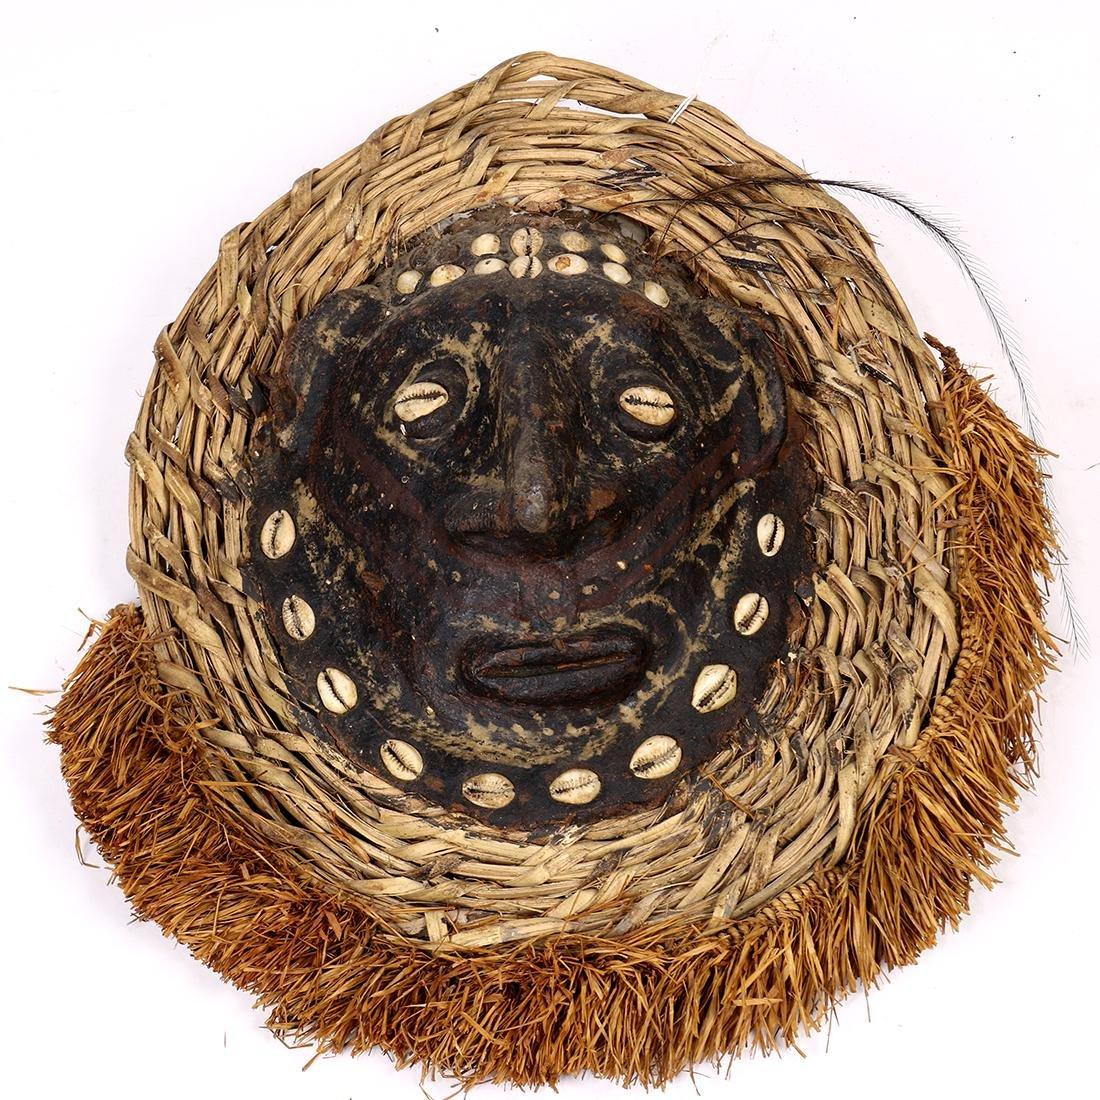 Papua New Guinea decorative mask